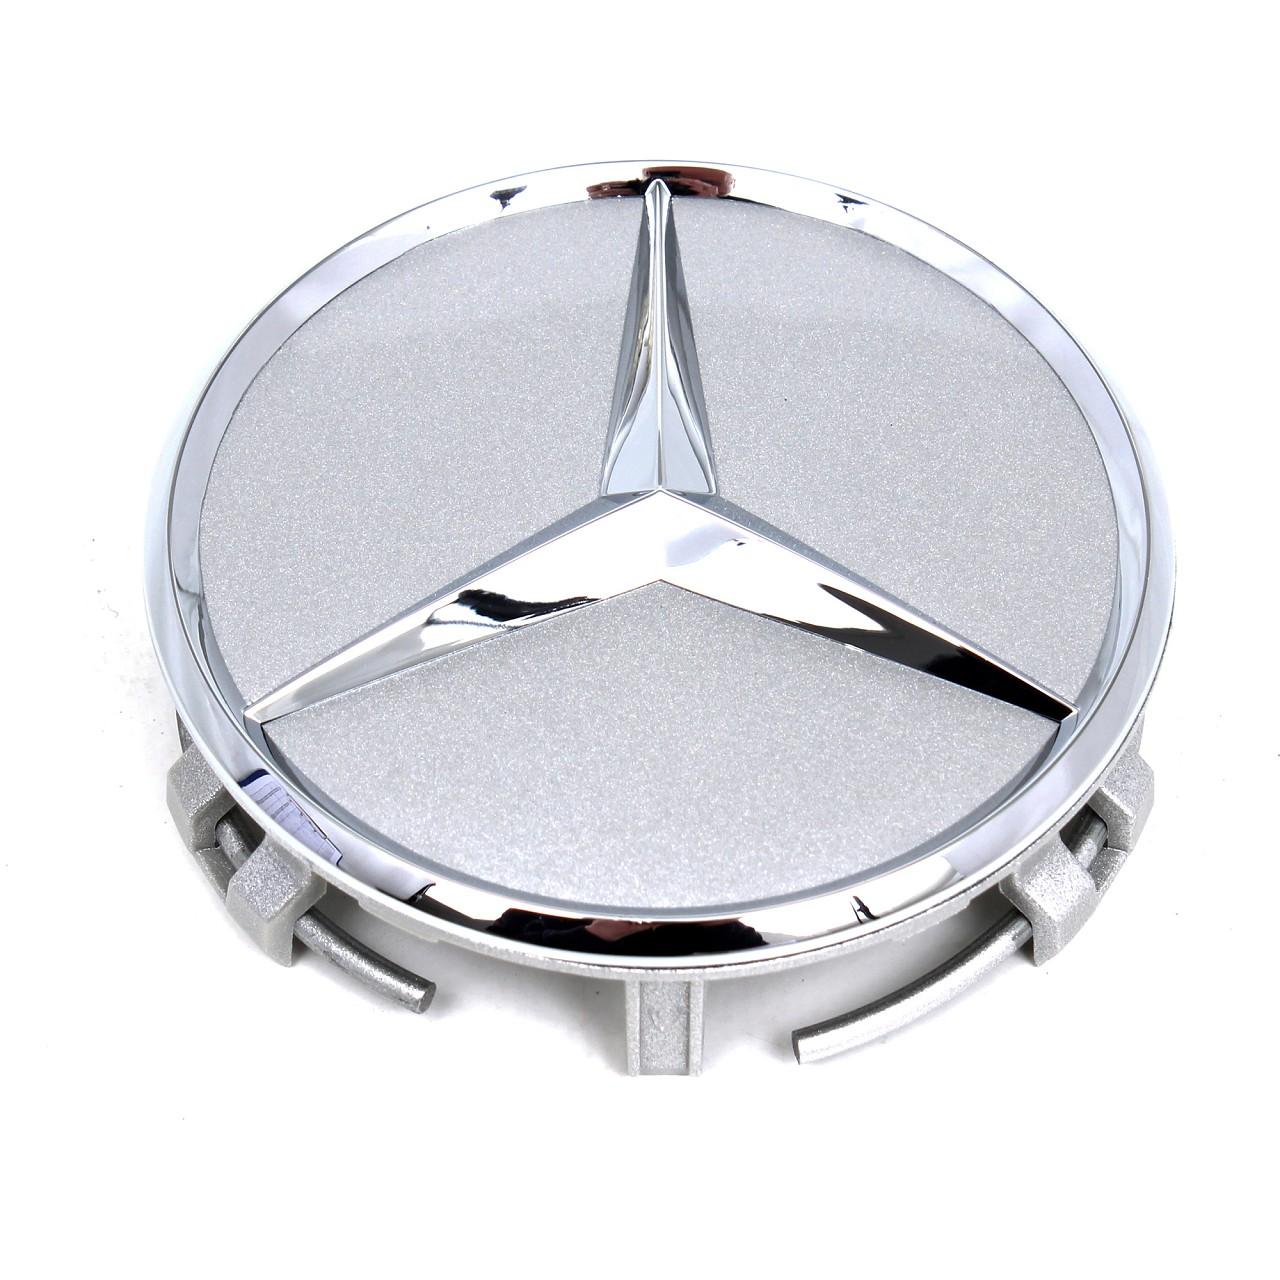 ORIGINAL Mercedes Nabendeckel Felgendeckel Ø 75 mm SILBER (1 Stück) 166470202